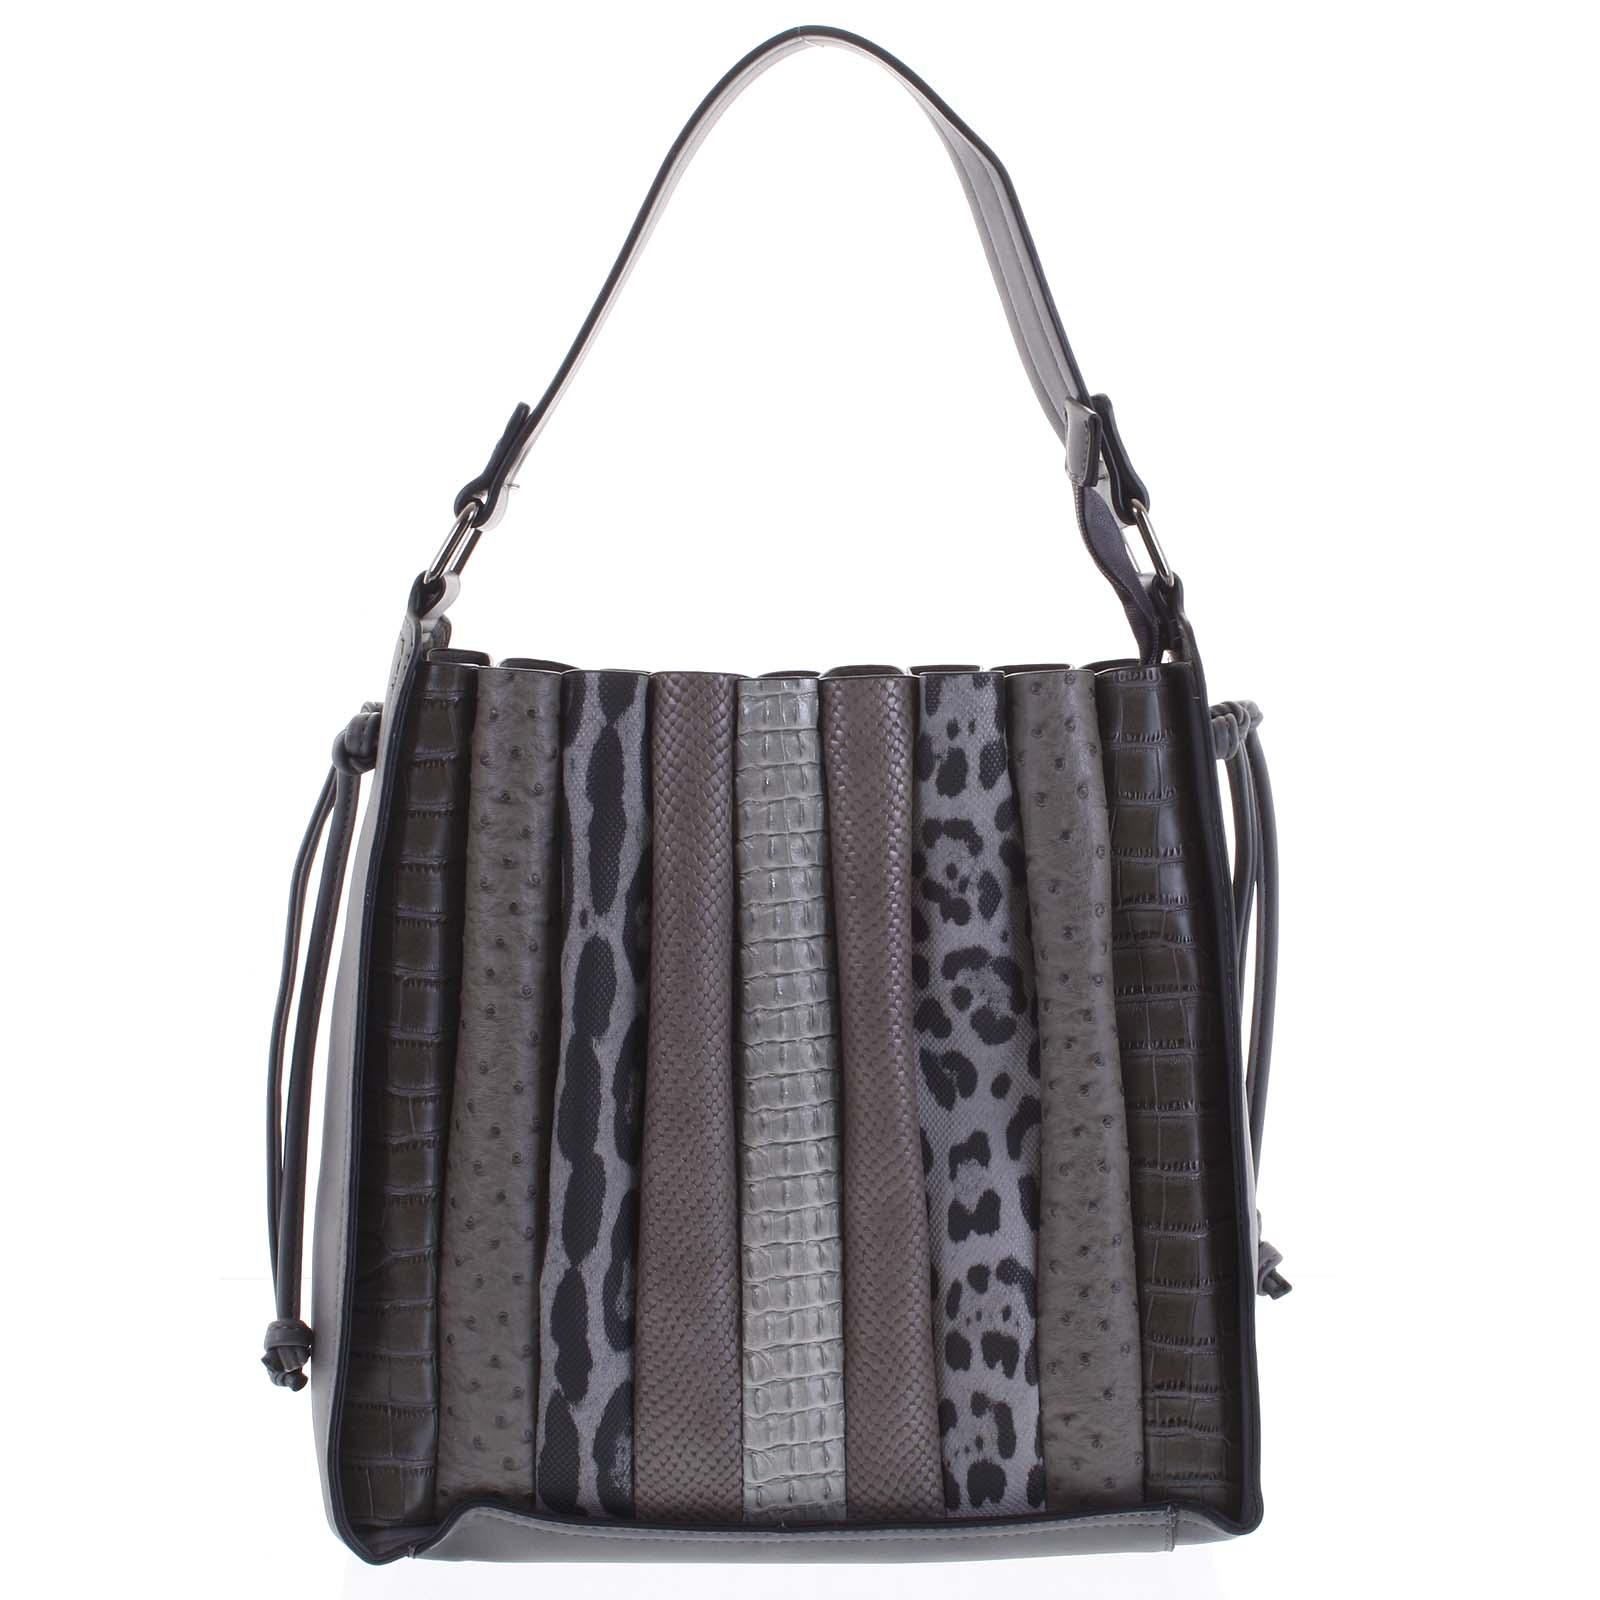 Dámska kabelka cez rameno tmavo šedá - Dudlin Pruet šedá